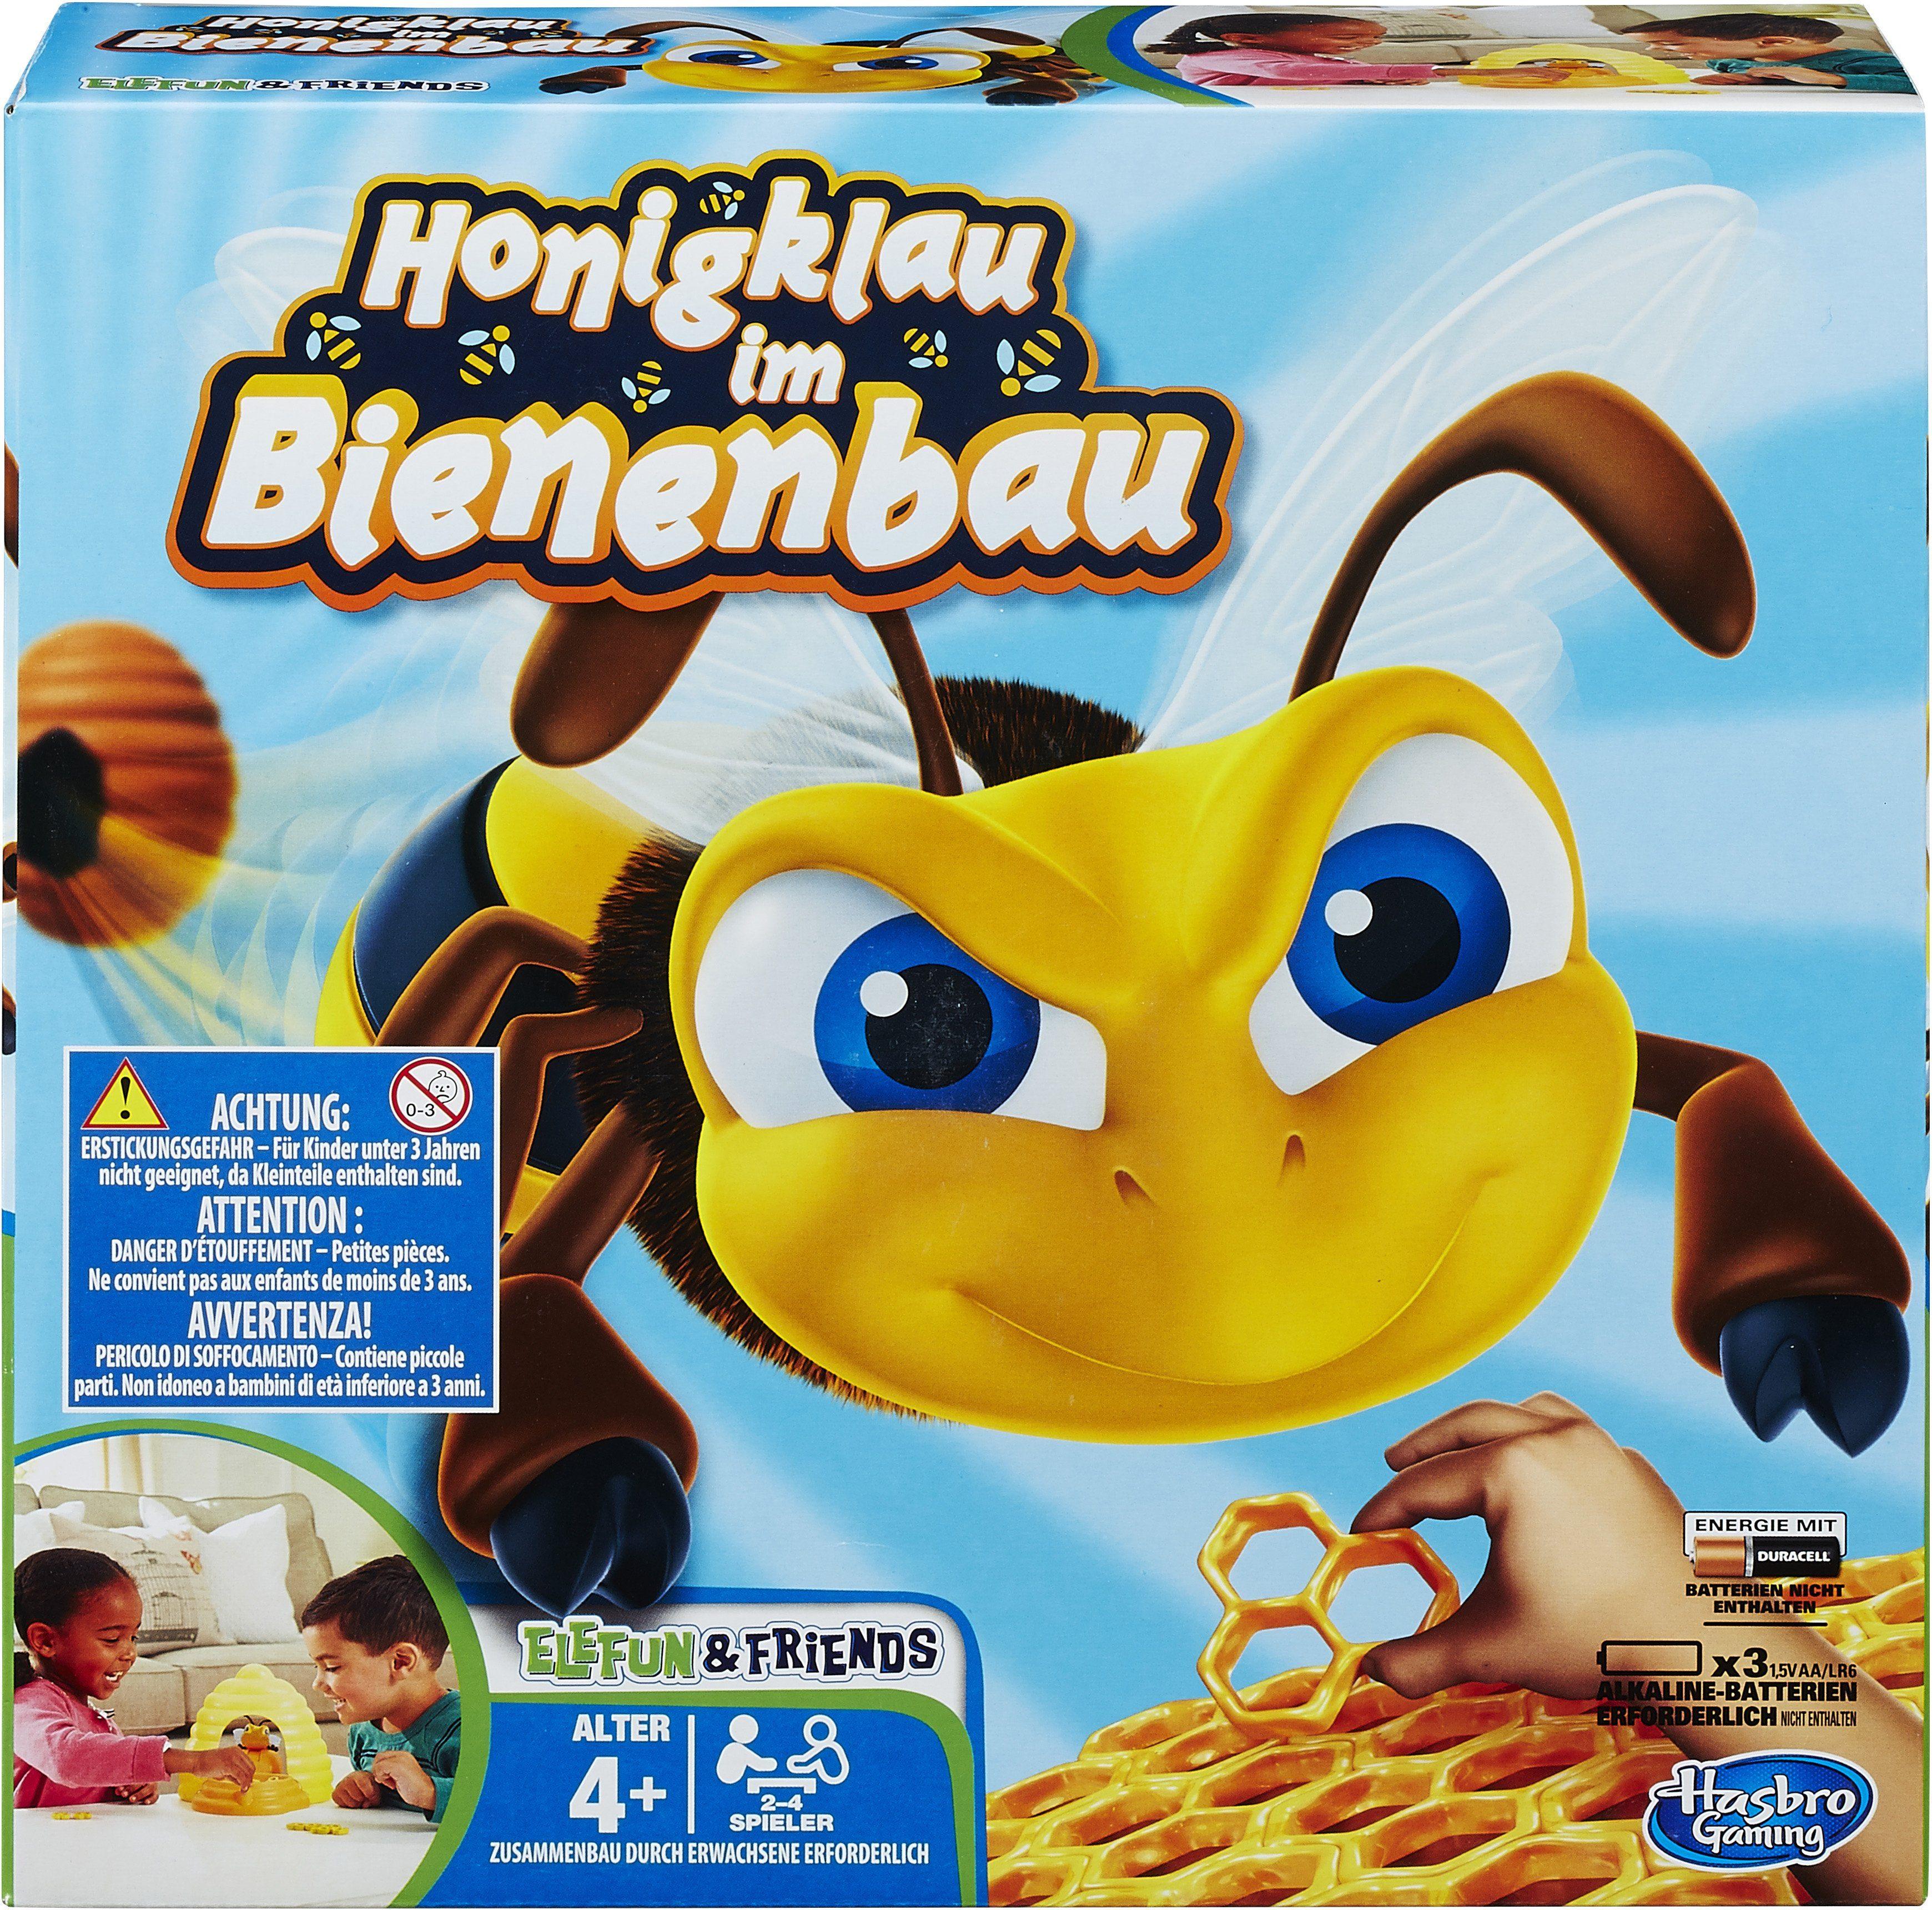 Hasbro Kinderspiel, »Hasbro Gaming, Honigklau im Bienenbau«